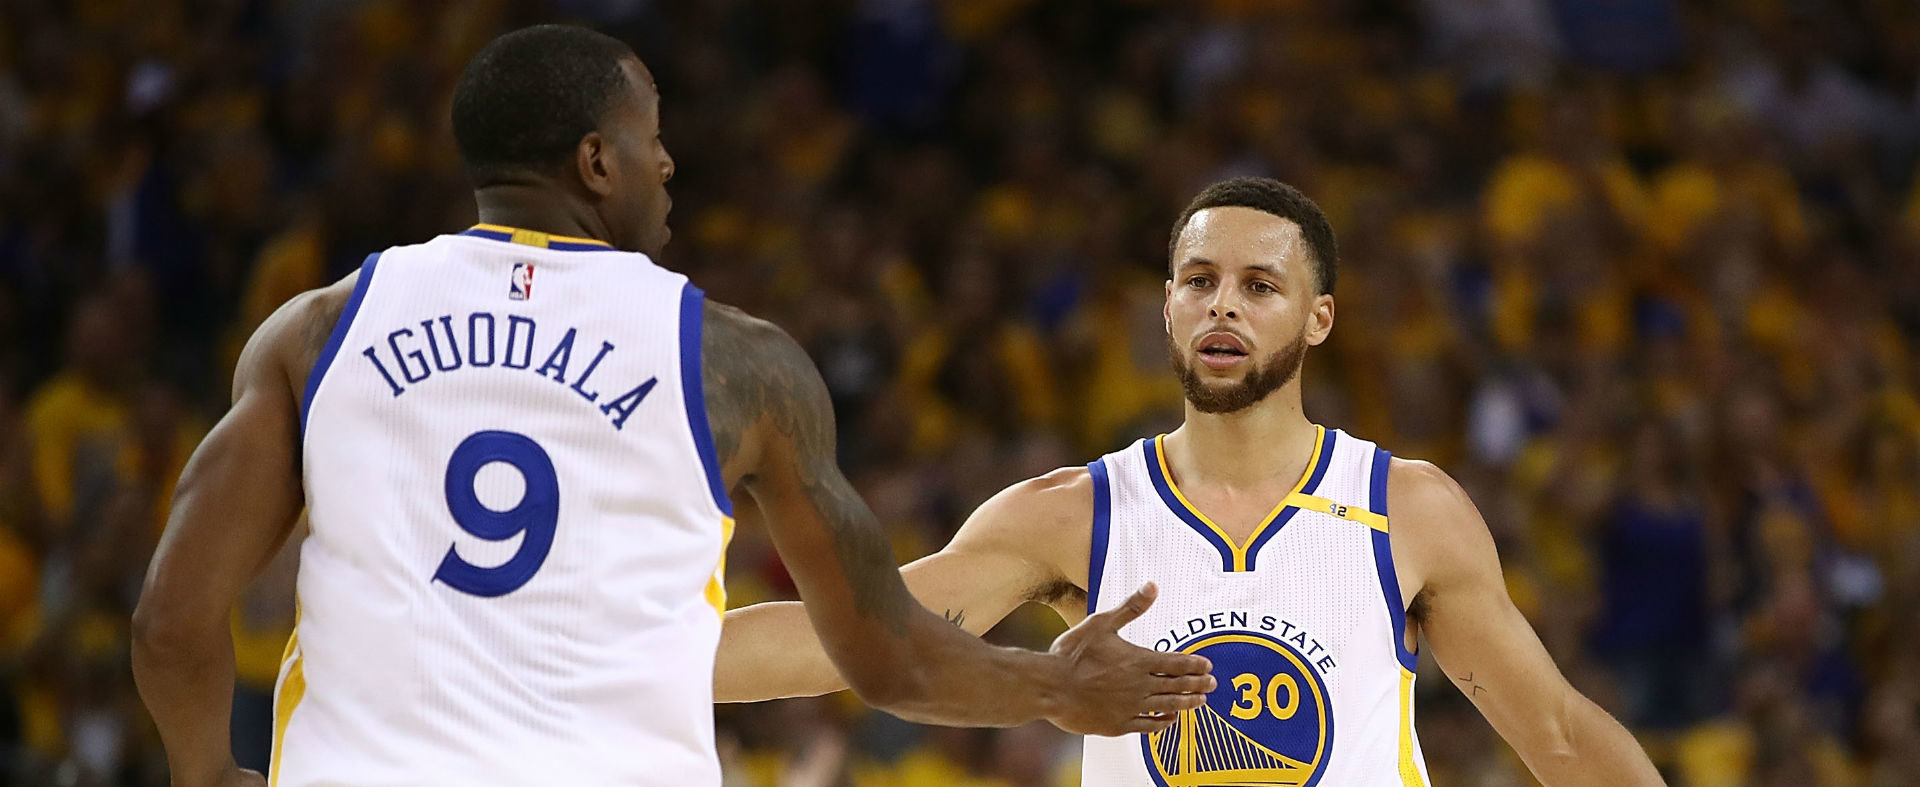 Andre Iguodala et Stephen Curry avec le maillot des Golden State Warriors